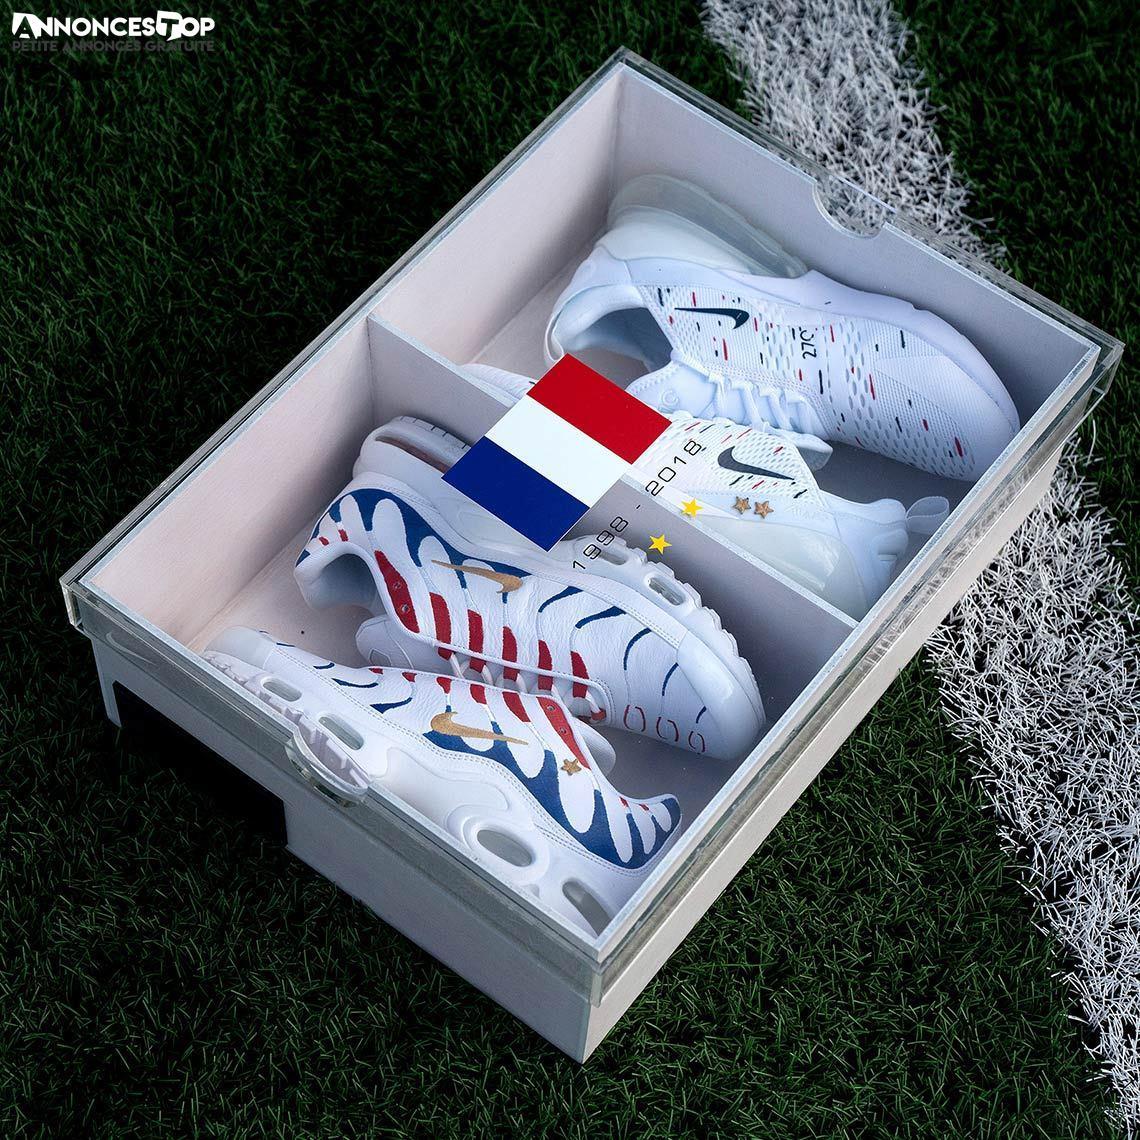 Annonce Nike Air Max 270 Kylian Mbappe Lottin Seine